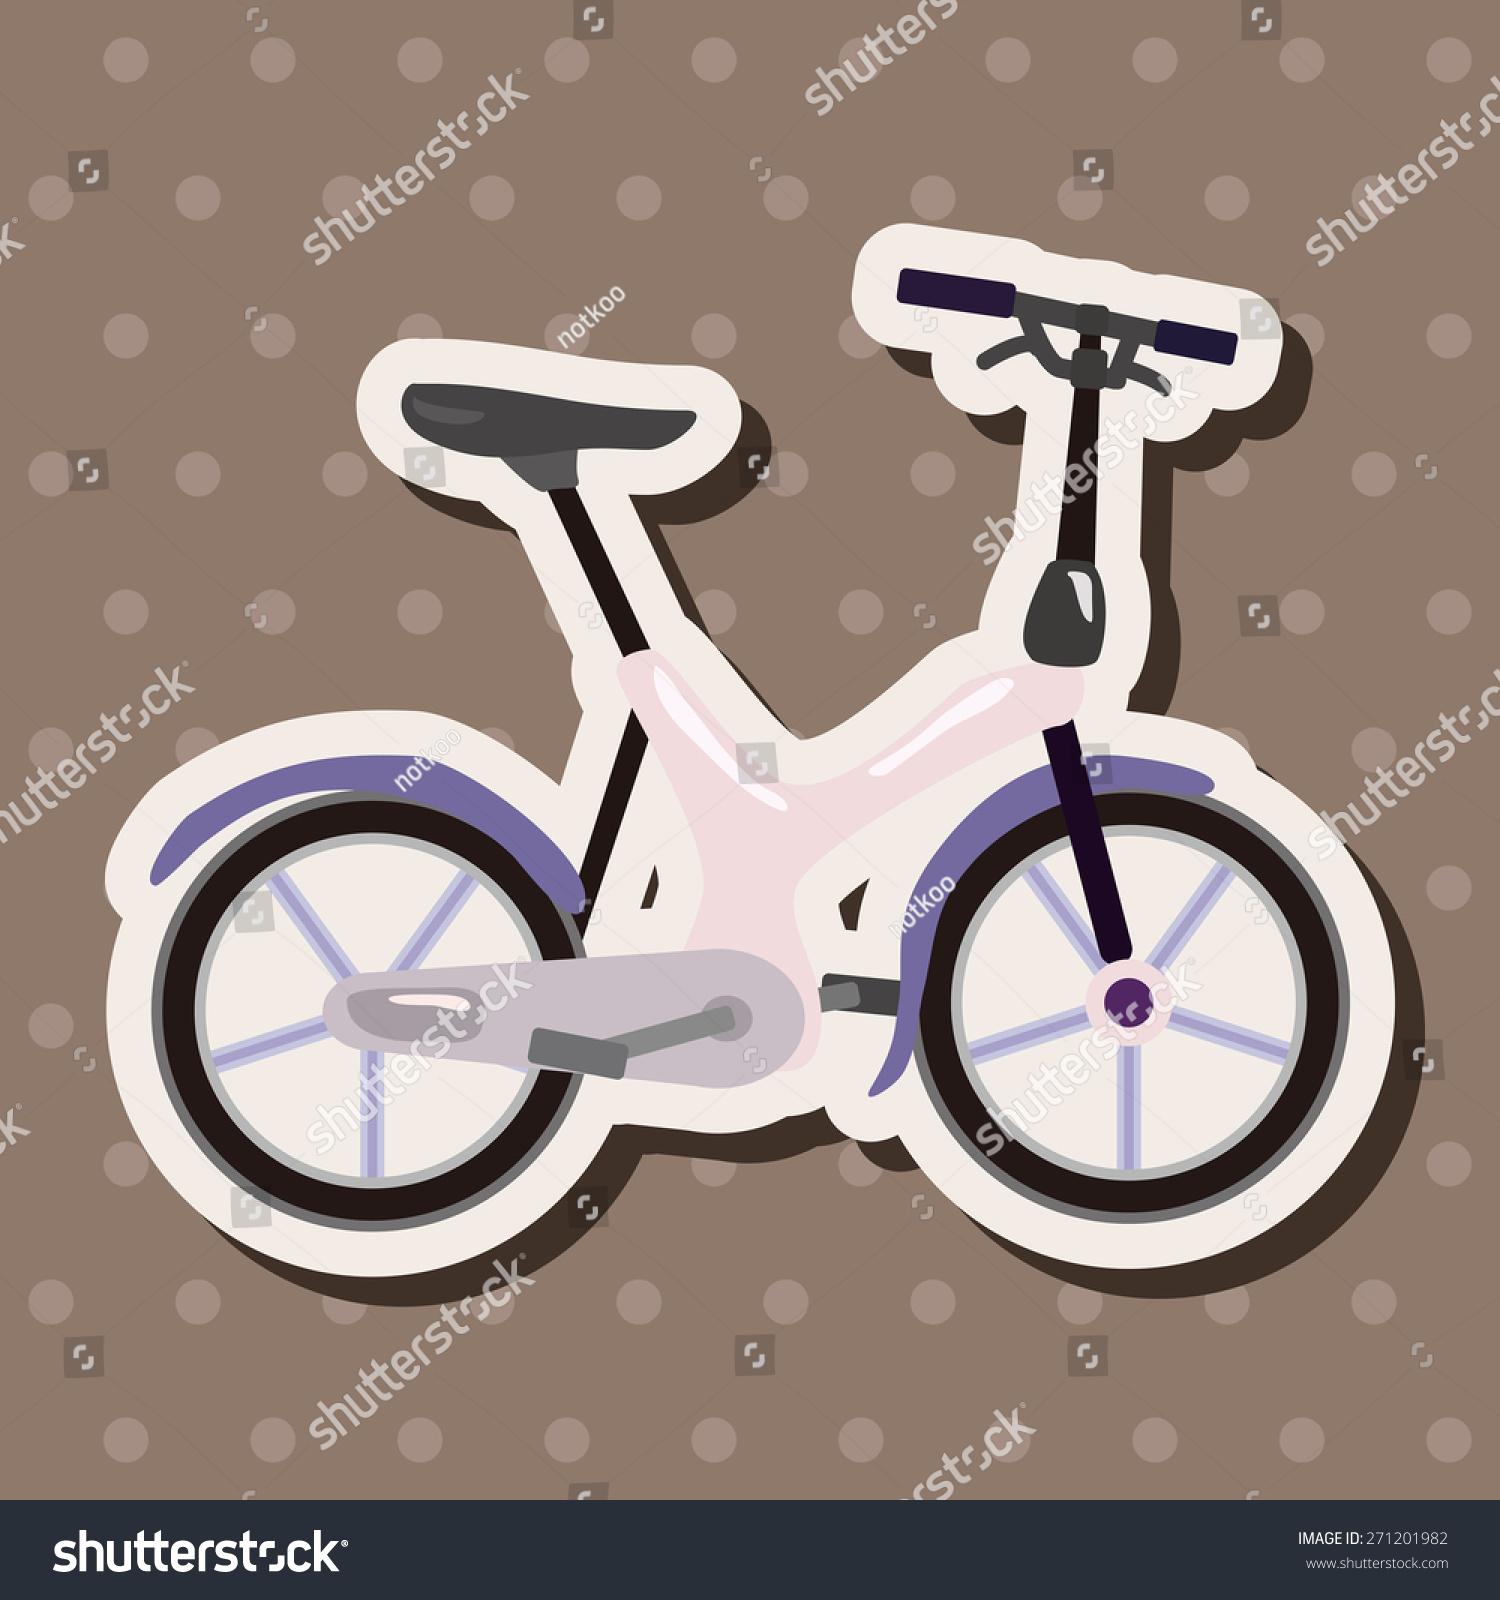 Bicycle cartoon design cartoon stickers icon